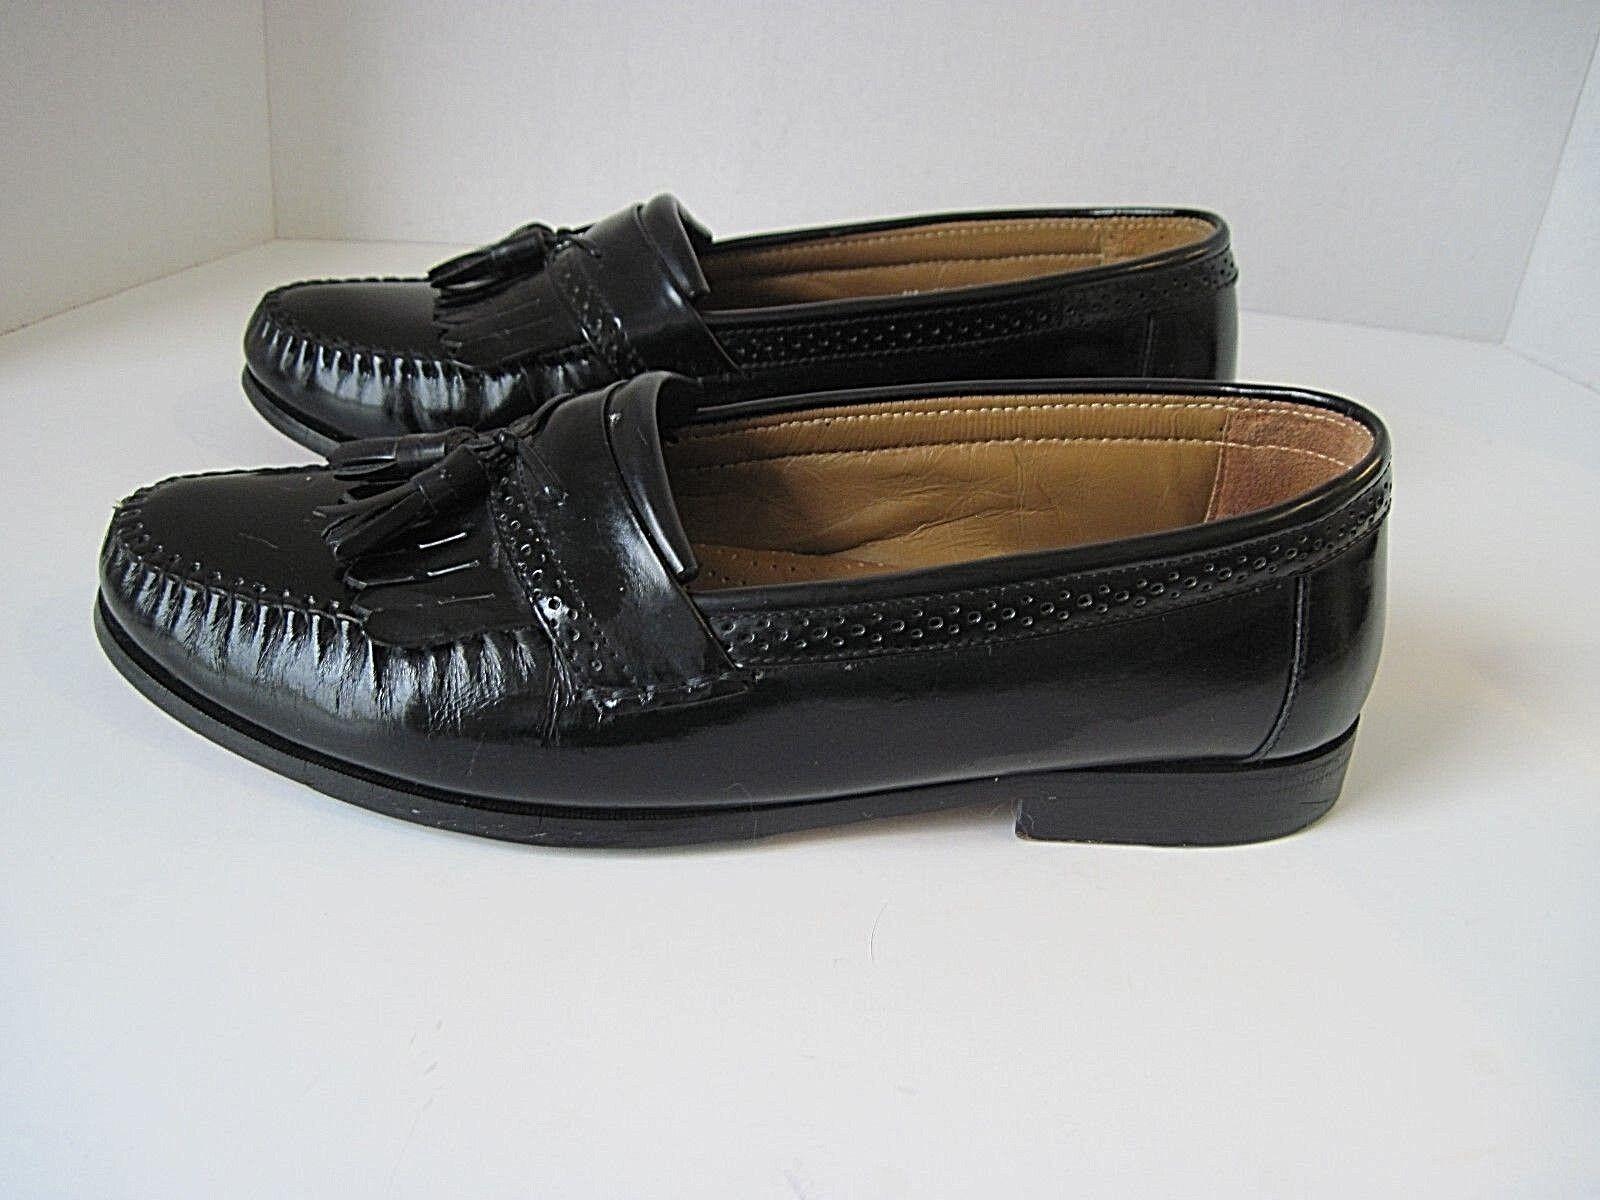 GH Bass & Co. Moc Toe Men's Loafers Black Leather Leather Black Kiltie Tassel Casual Size 11EE 9d0acf